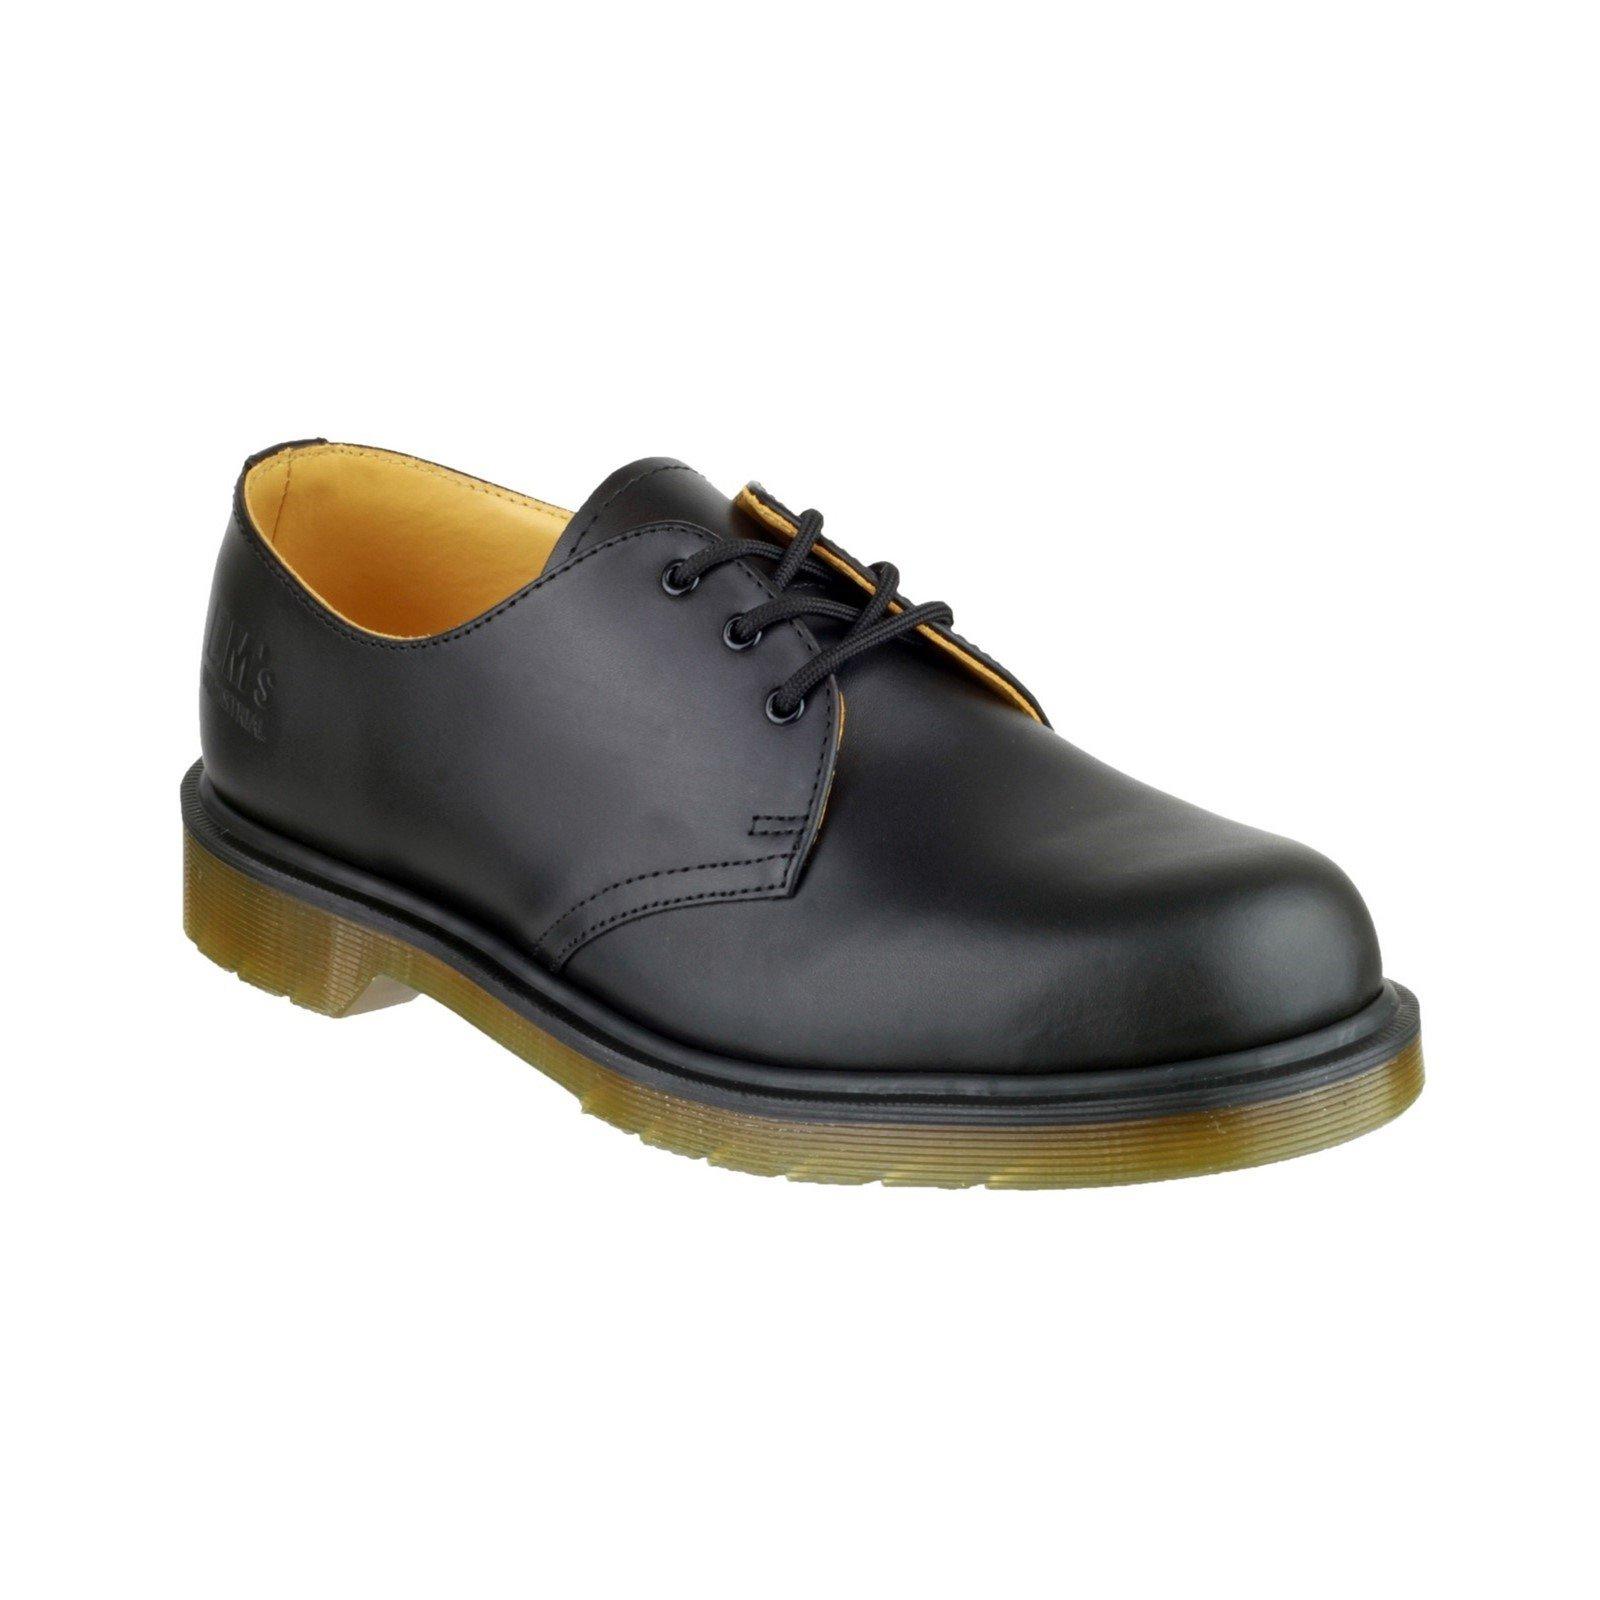 Dr Martens Men's Lace-Up Leather Derby Shoe Black 04915 - Black 13